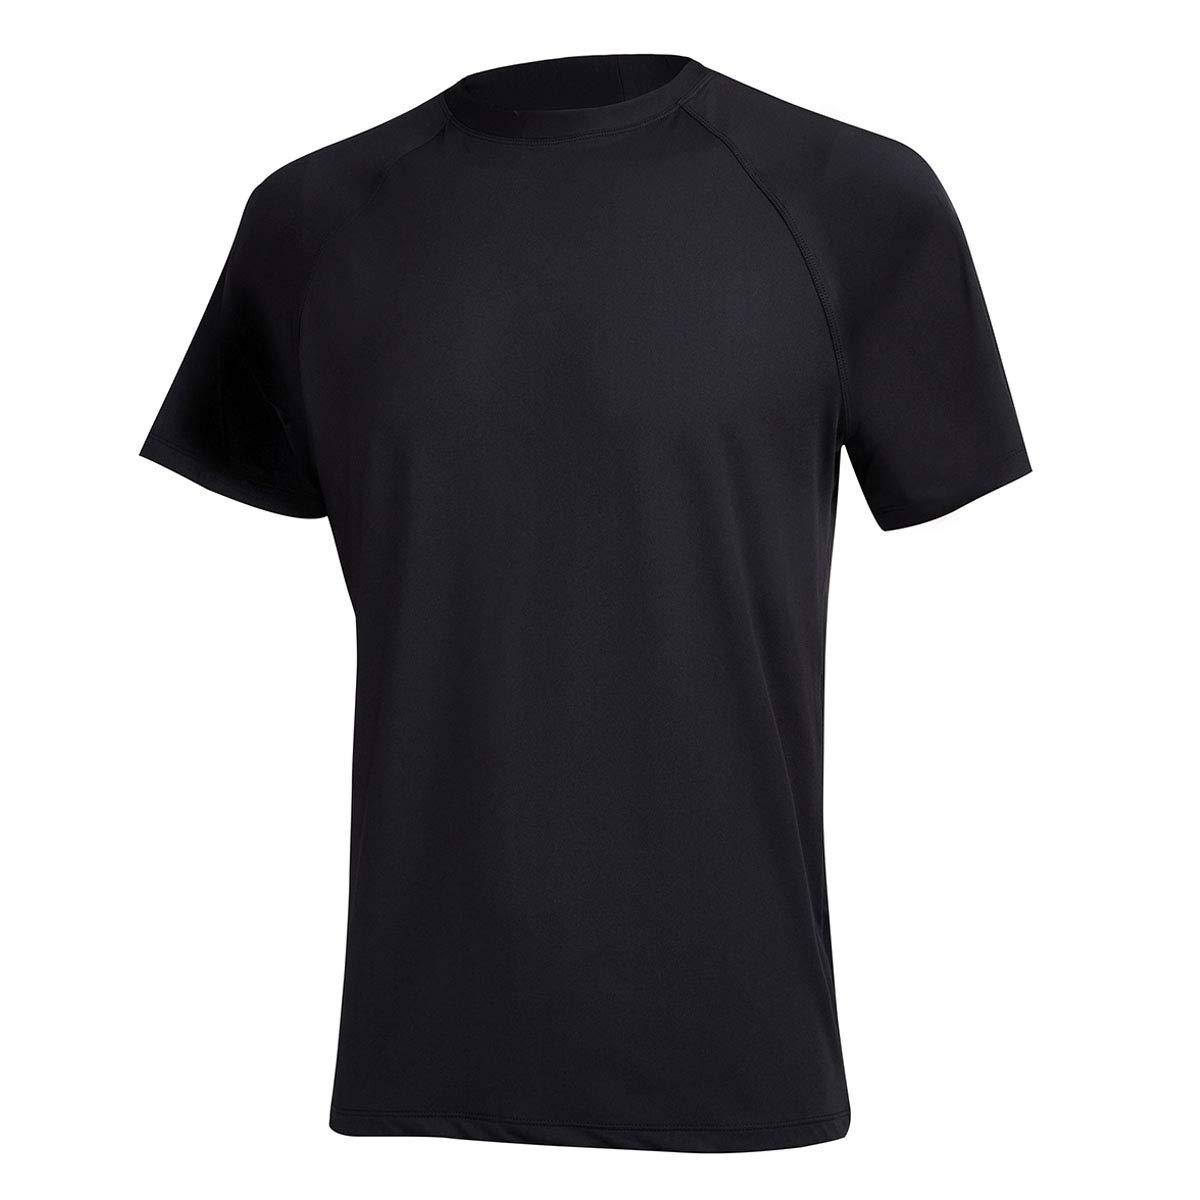 Satankud Men's UPF 50+ Rashguard Swim Tee Short Sleeve Sun Shirt Swimwear Swim Shirts Black XXL by Satankud